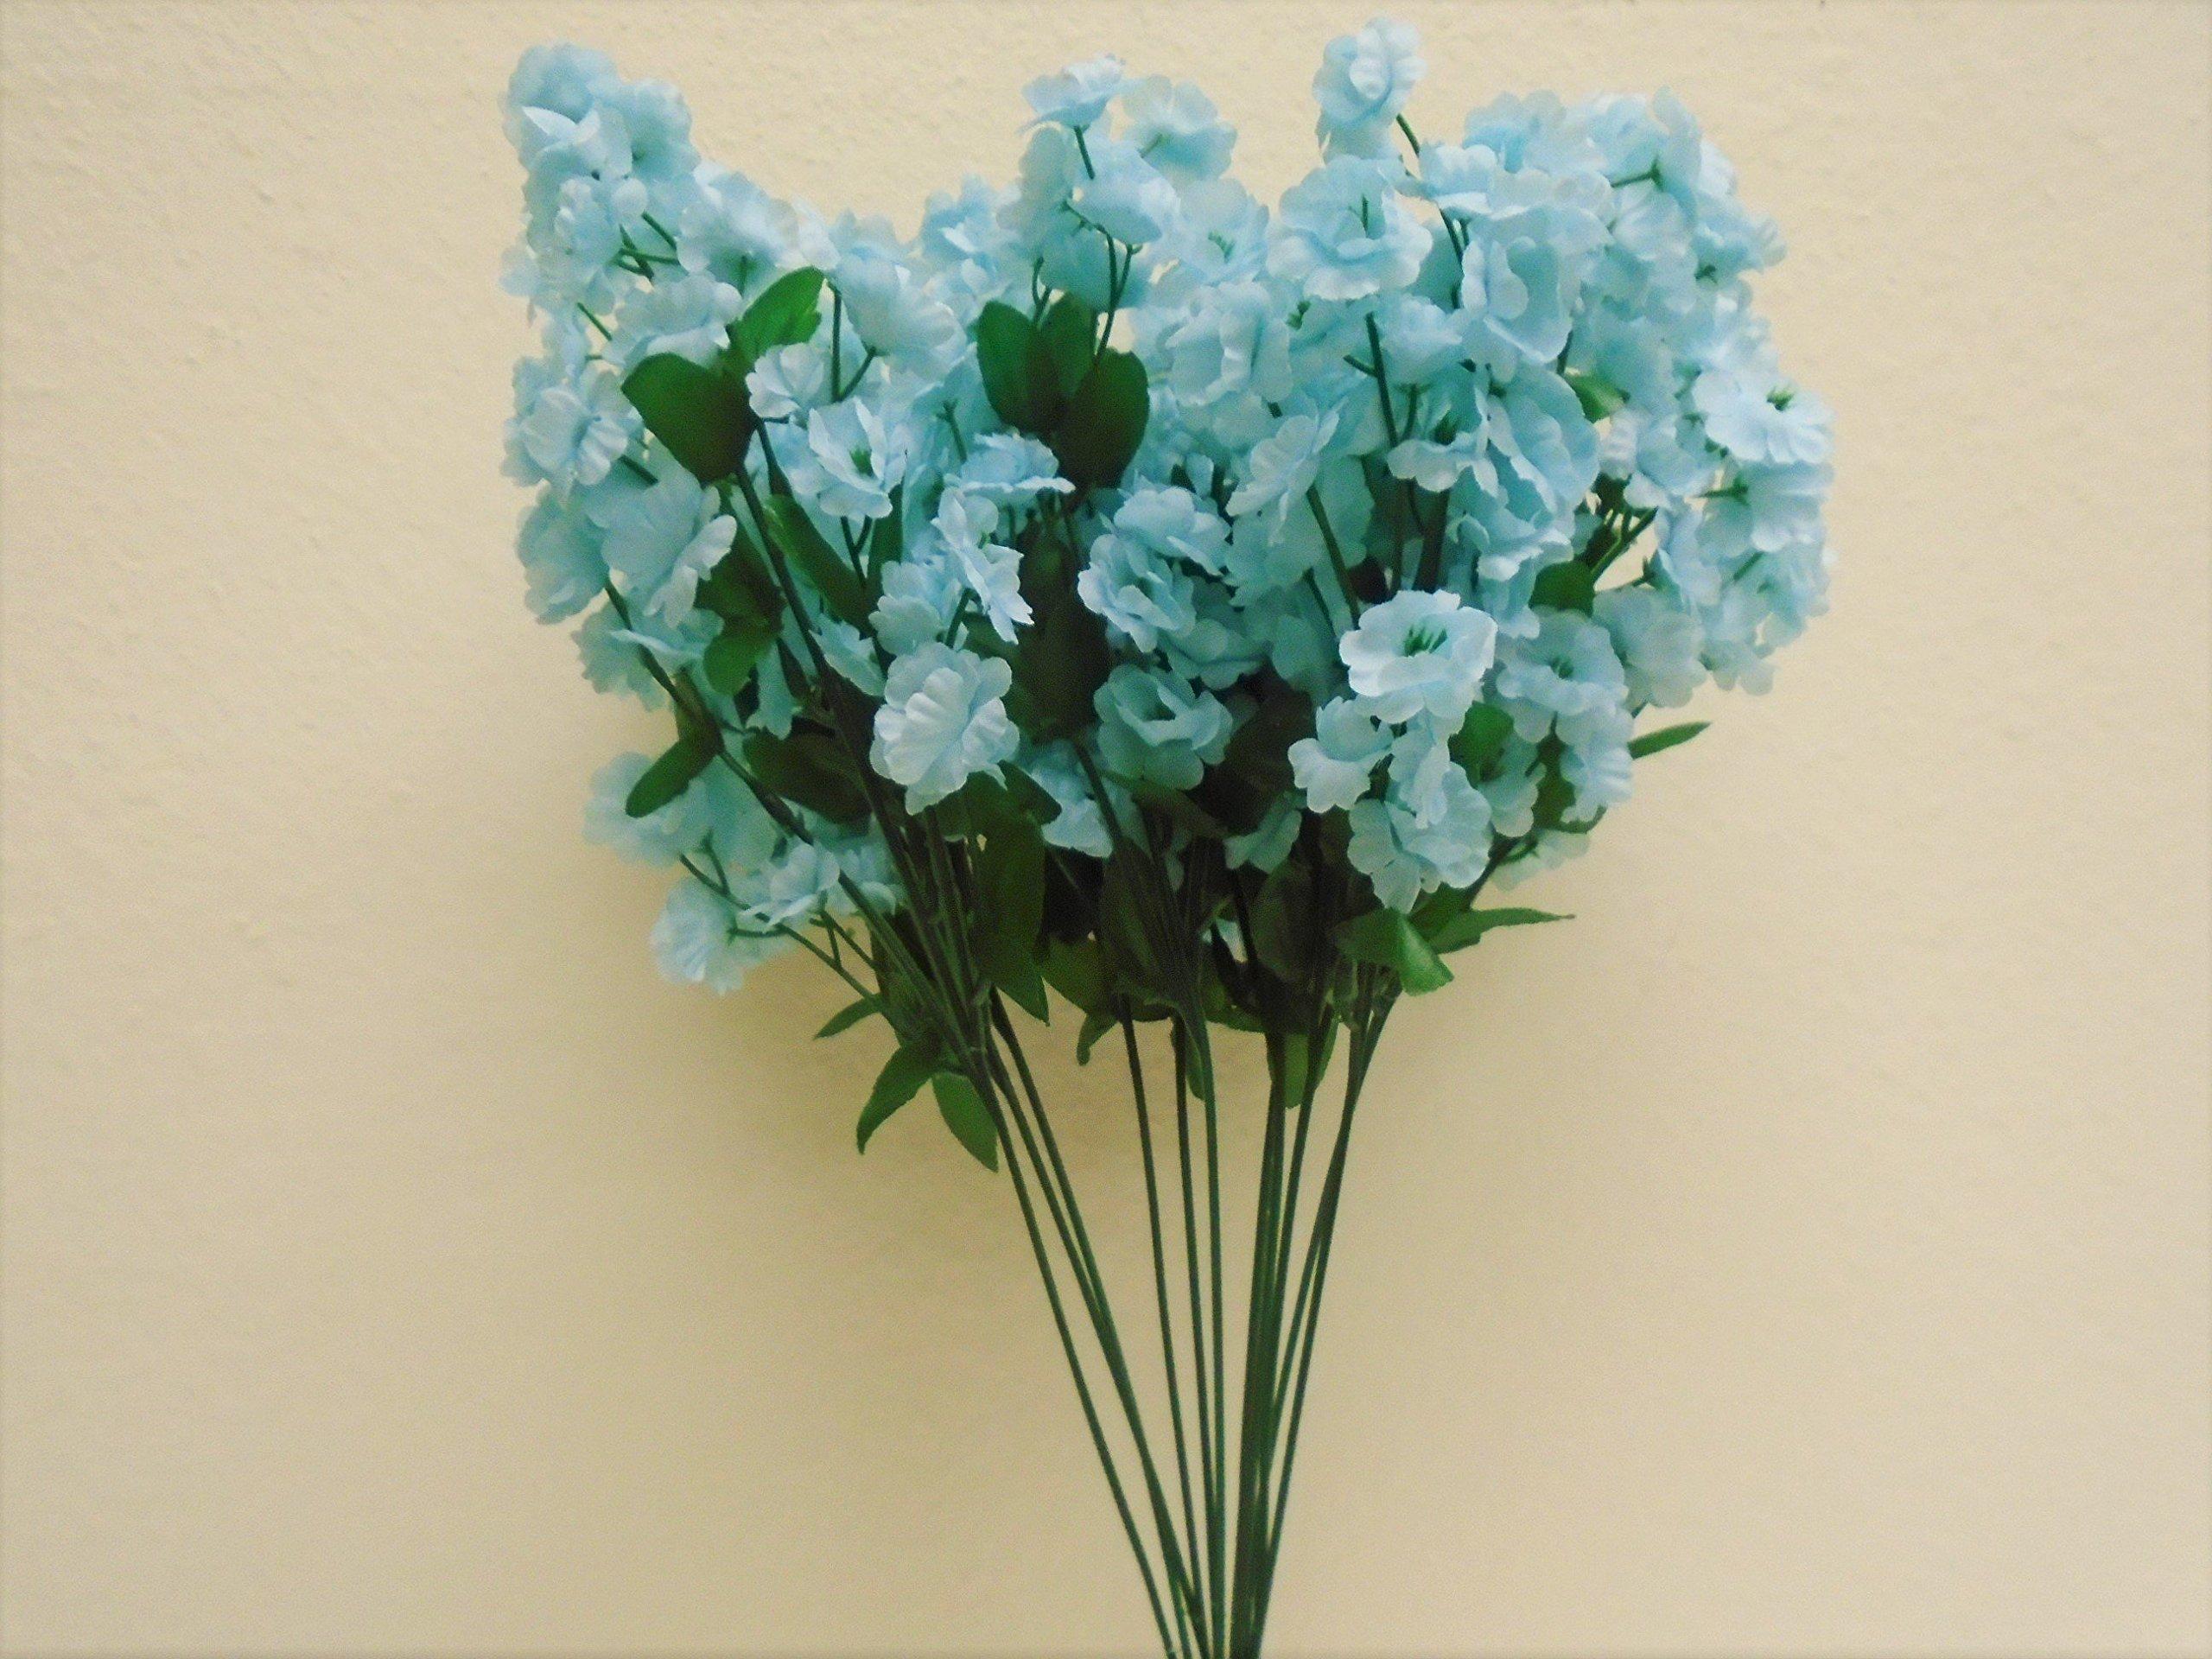 Phoenix-Silk-12-Sprays-Ruffle-Baby-Breath-Filler-Artificial-Silk-Flowers-15-Stem-331